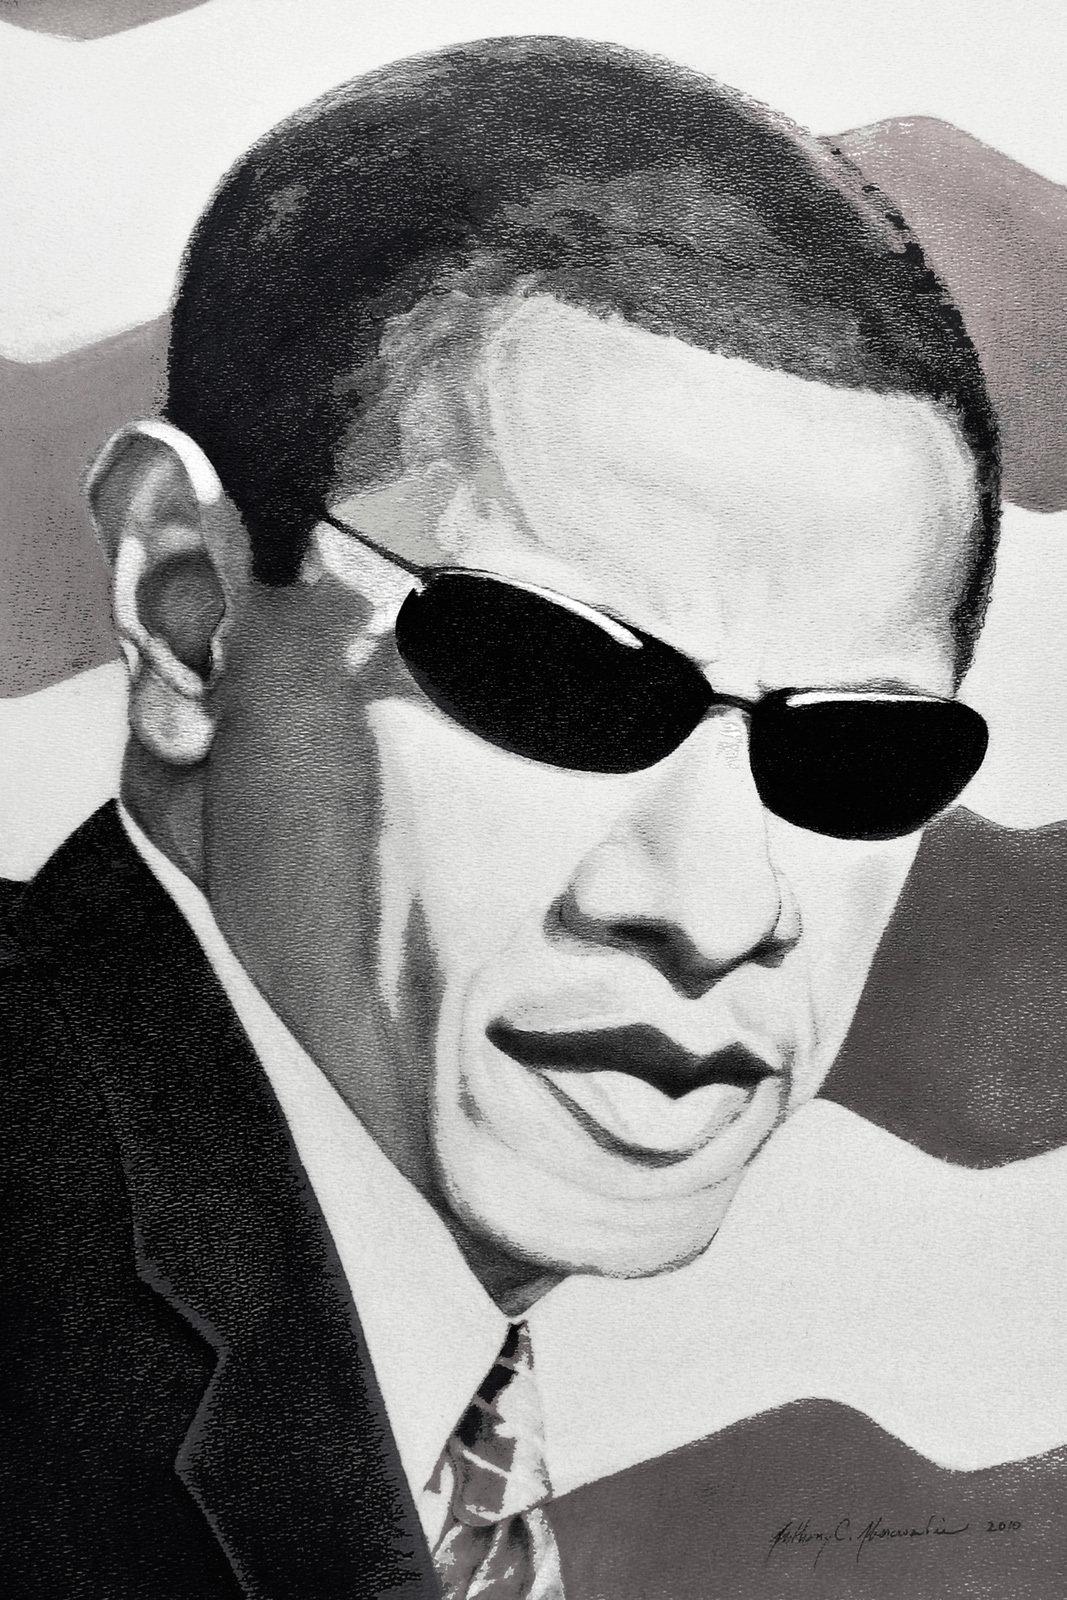 Black and White Obama Portrait 24x36 Black Frame Deposit Only 00004